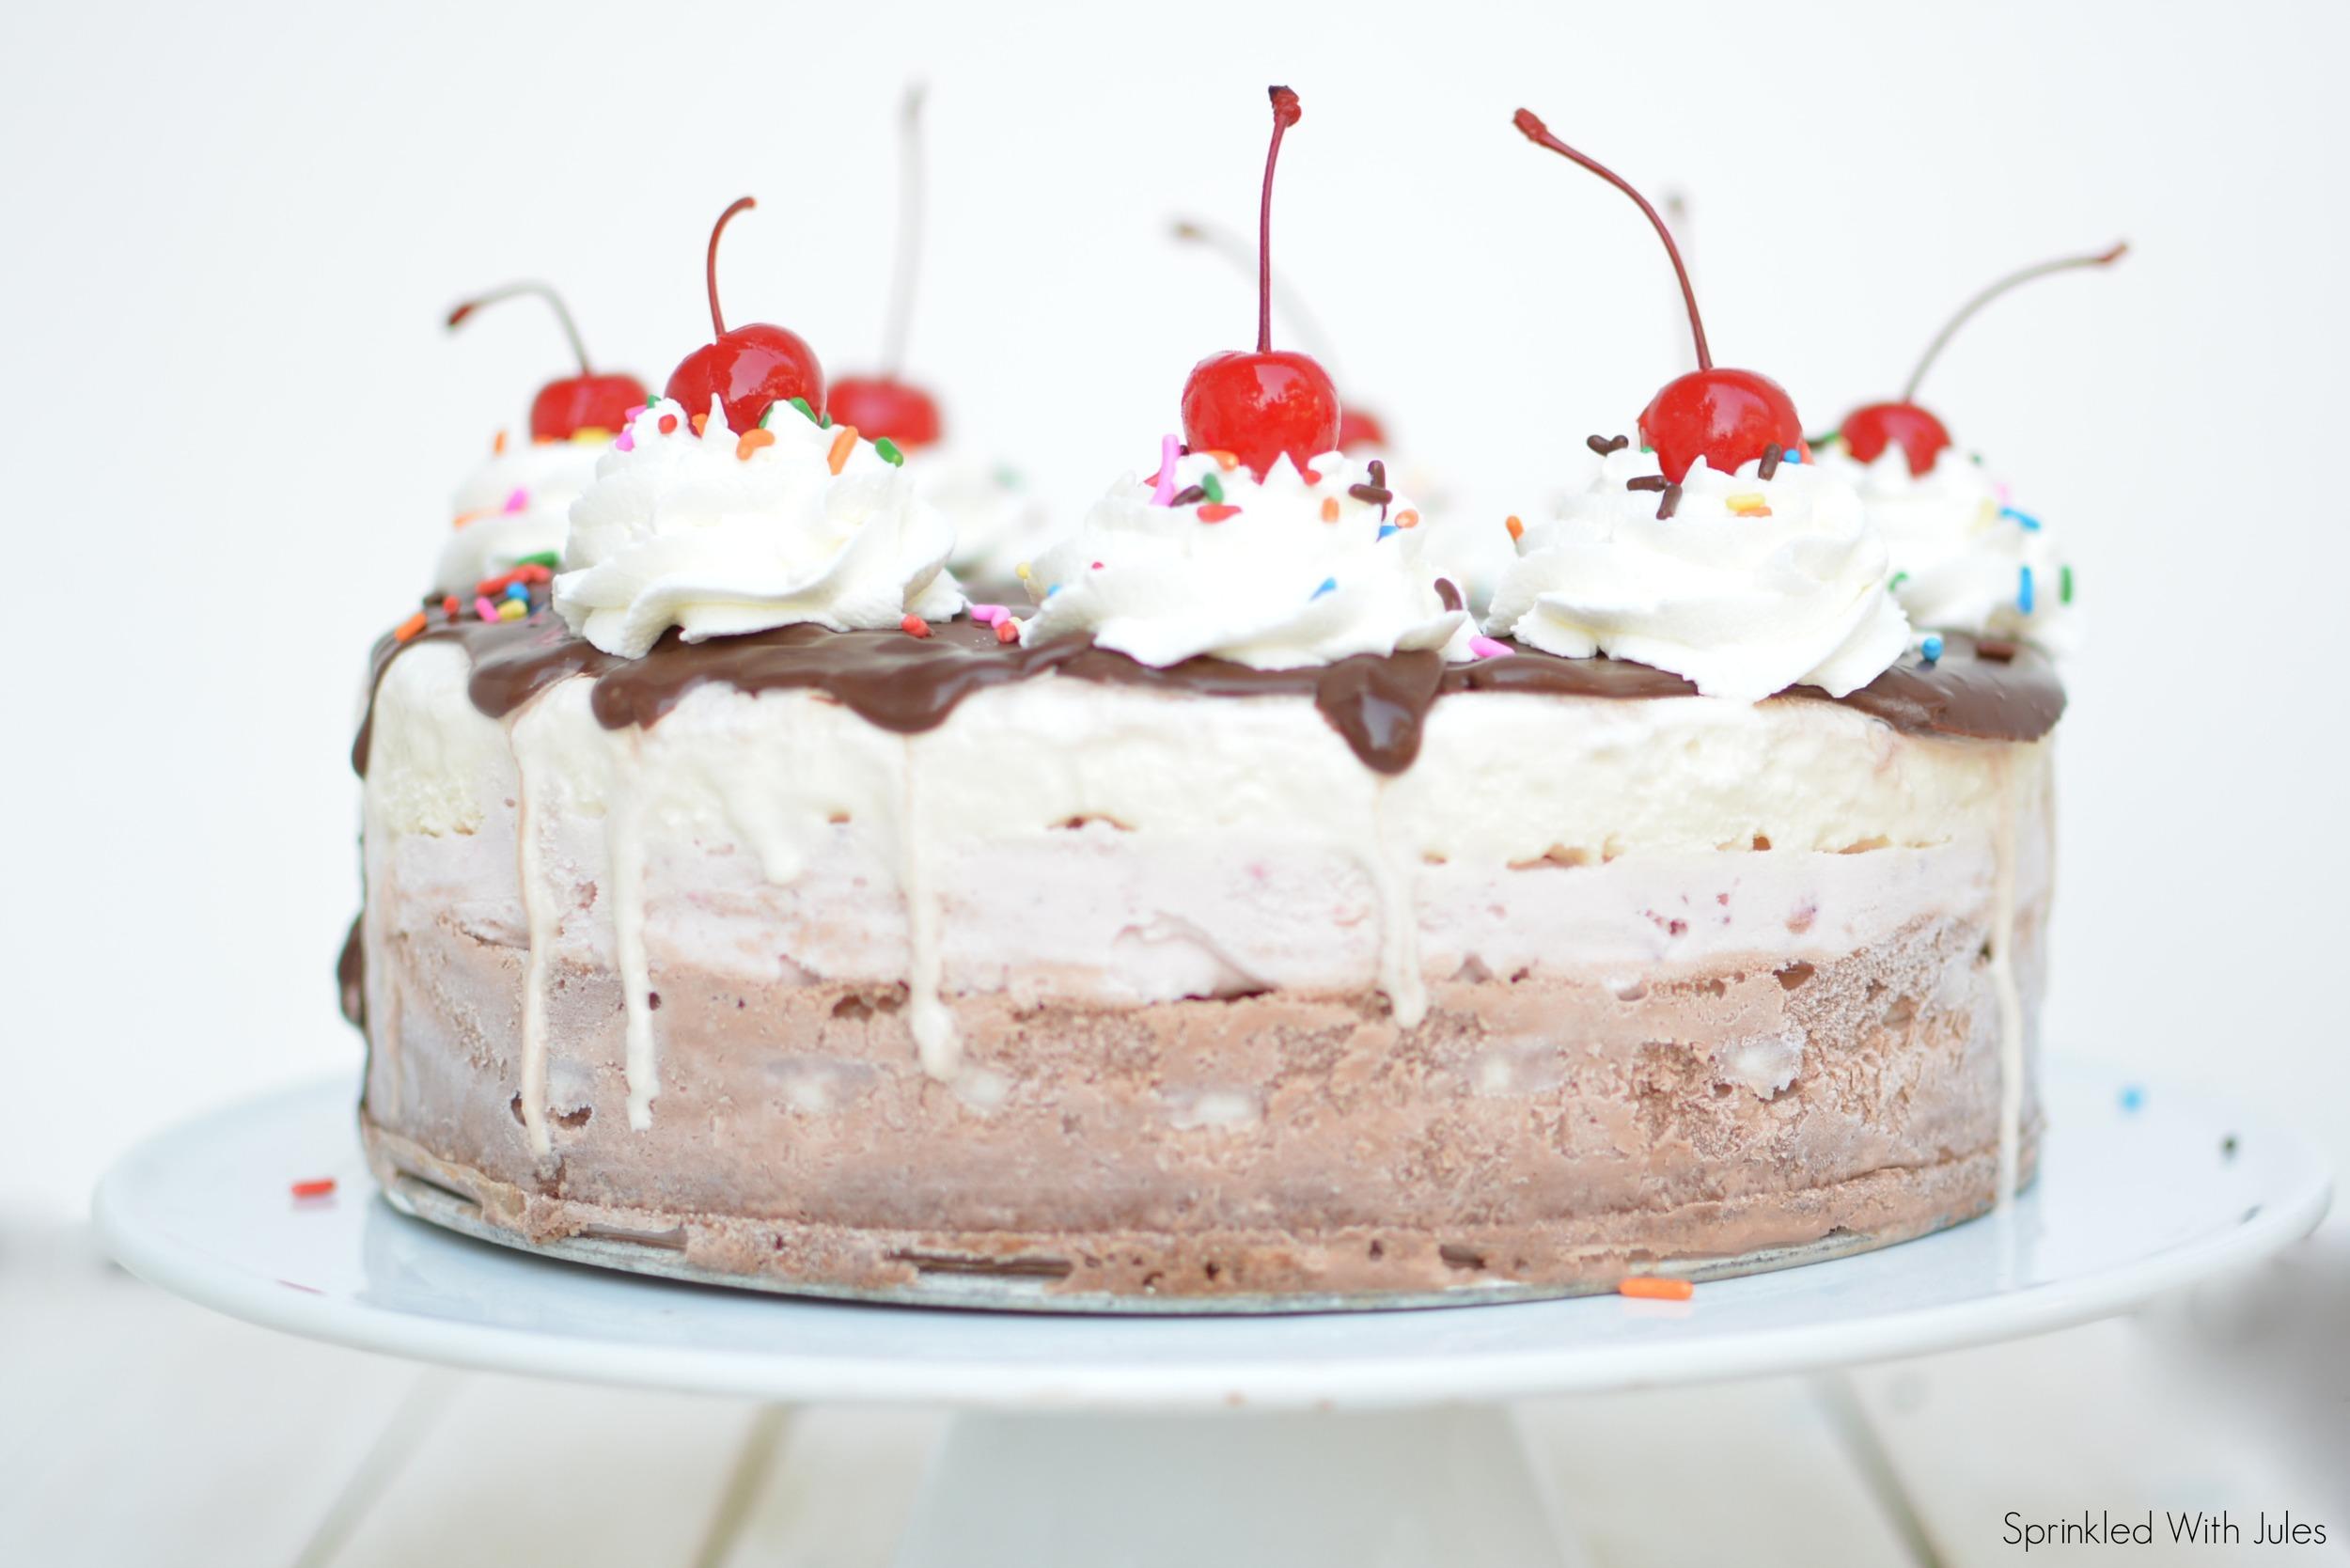 Banana Split Ice Cream Cake / Sprinkled With Jules